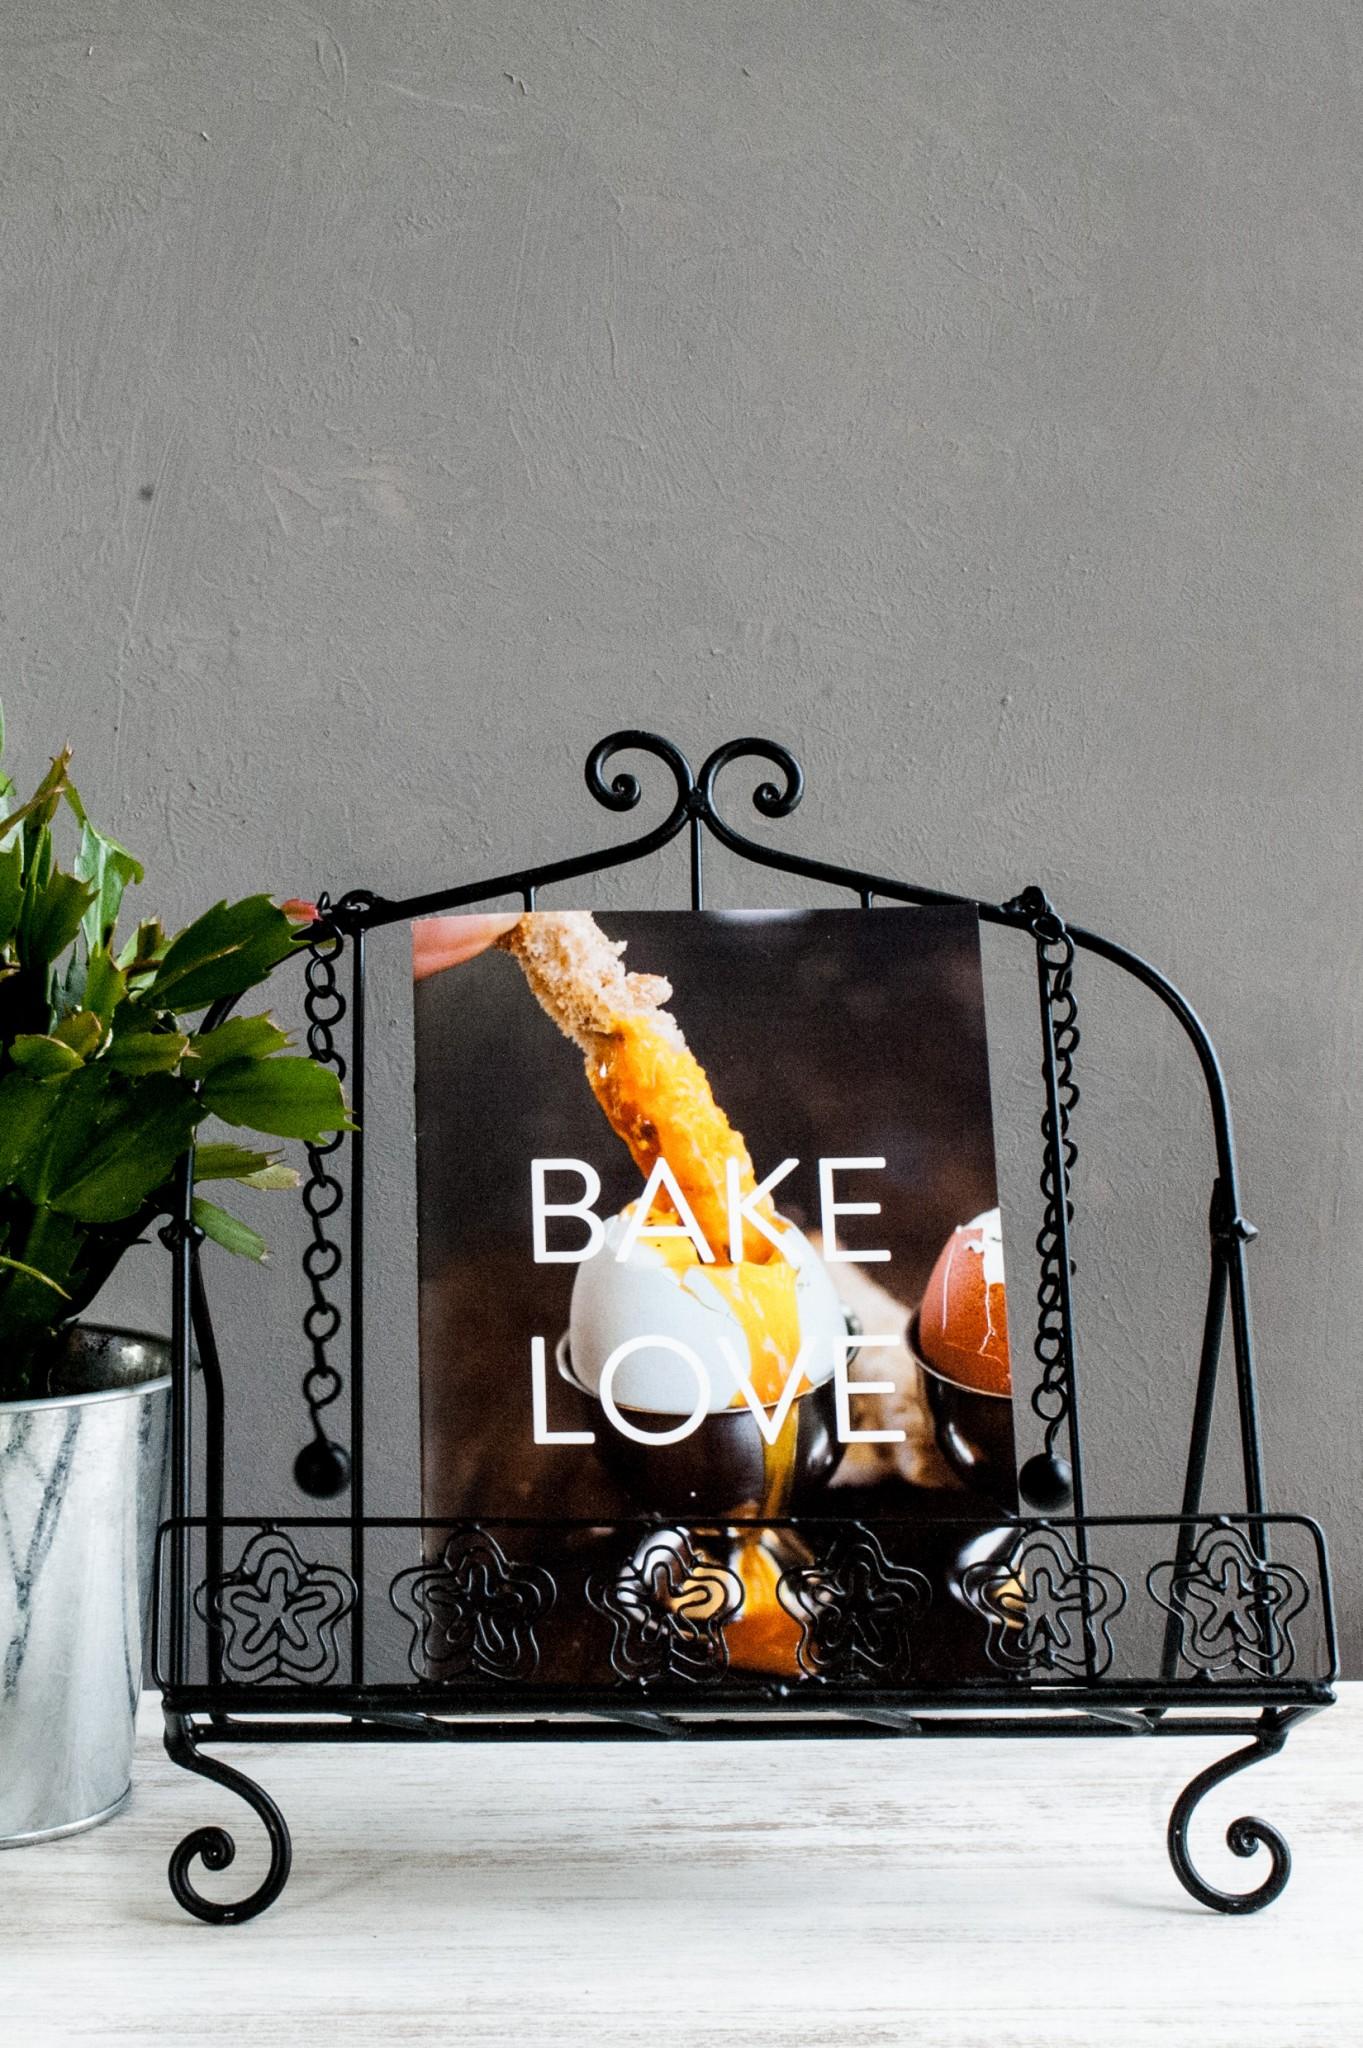 BakeLoveBookletPics-4453